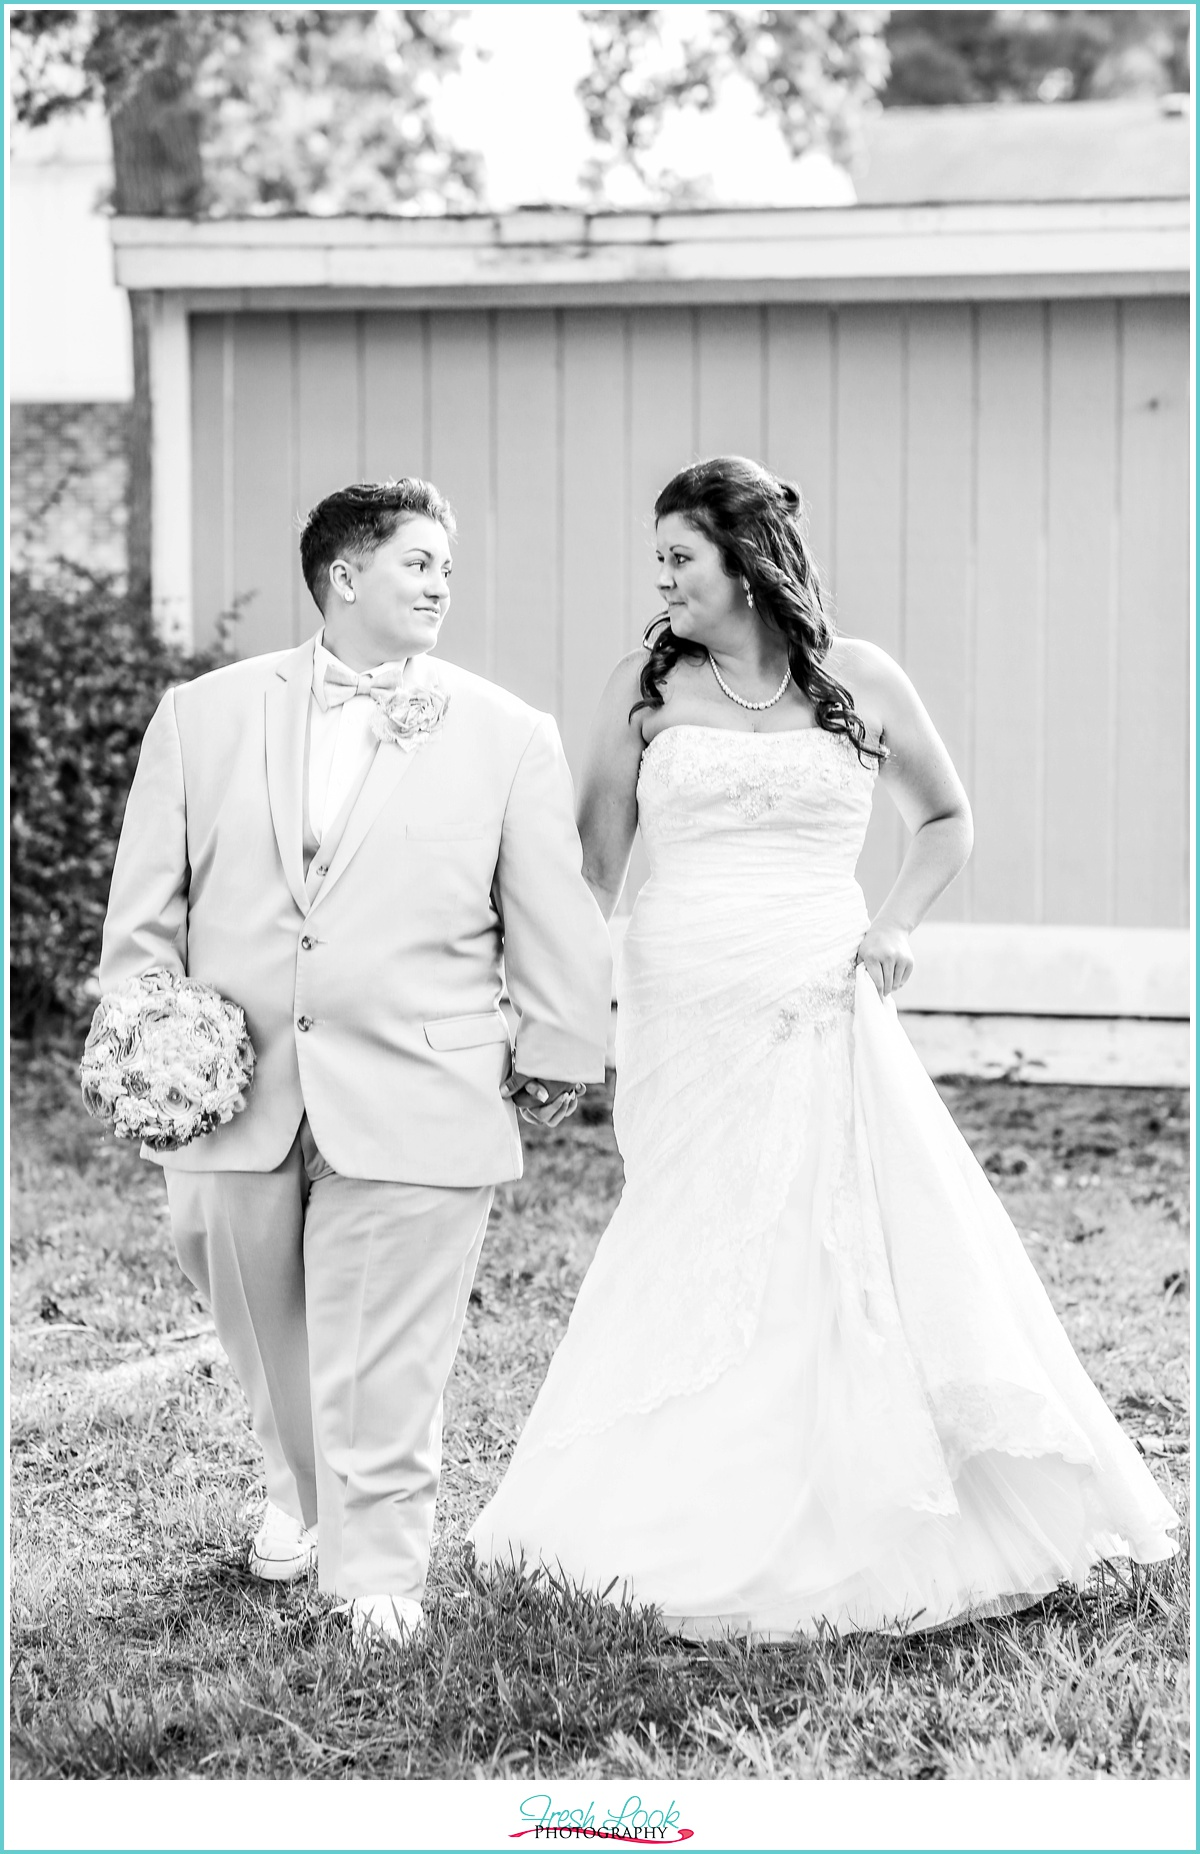 romantic black and white wedding